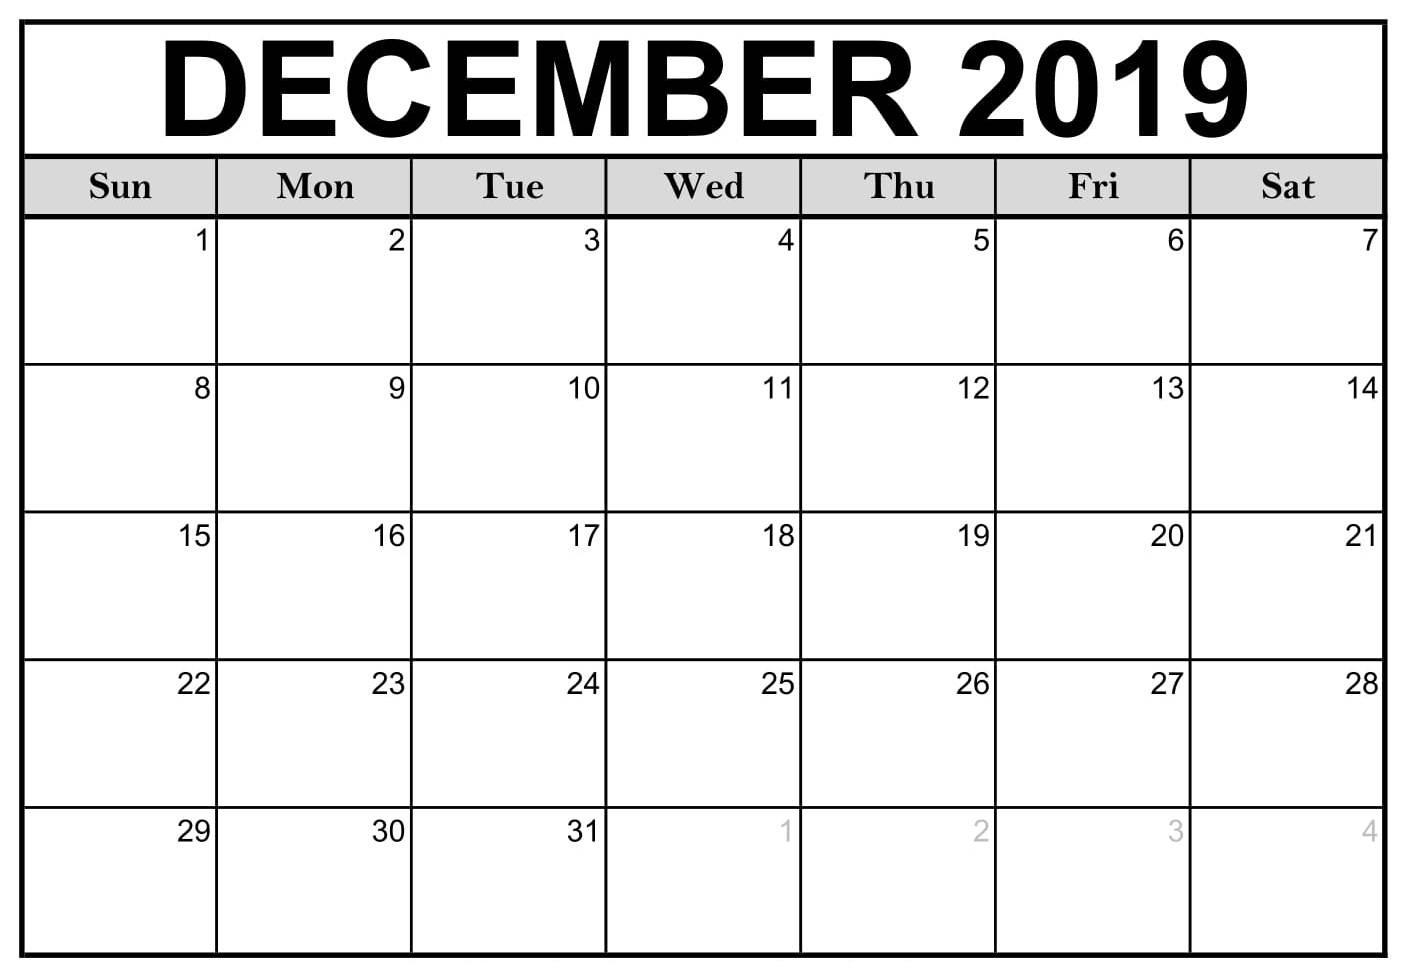 Free Printable December 2019 Calendar Notes - 2019 Calendars